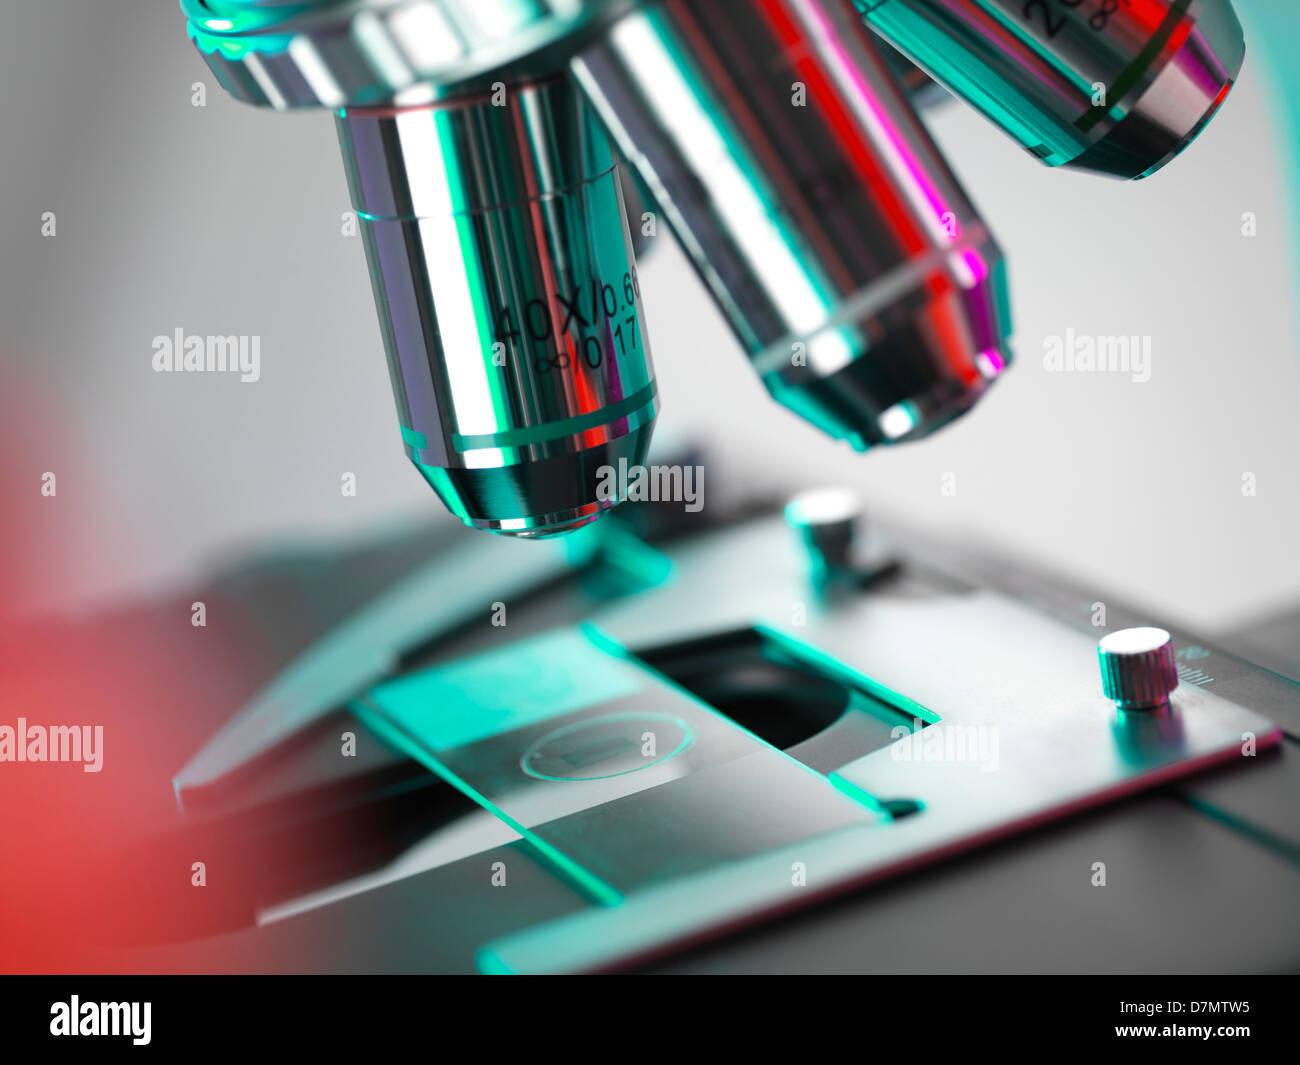 Light microscope - Stock Image